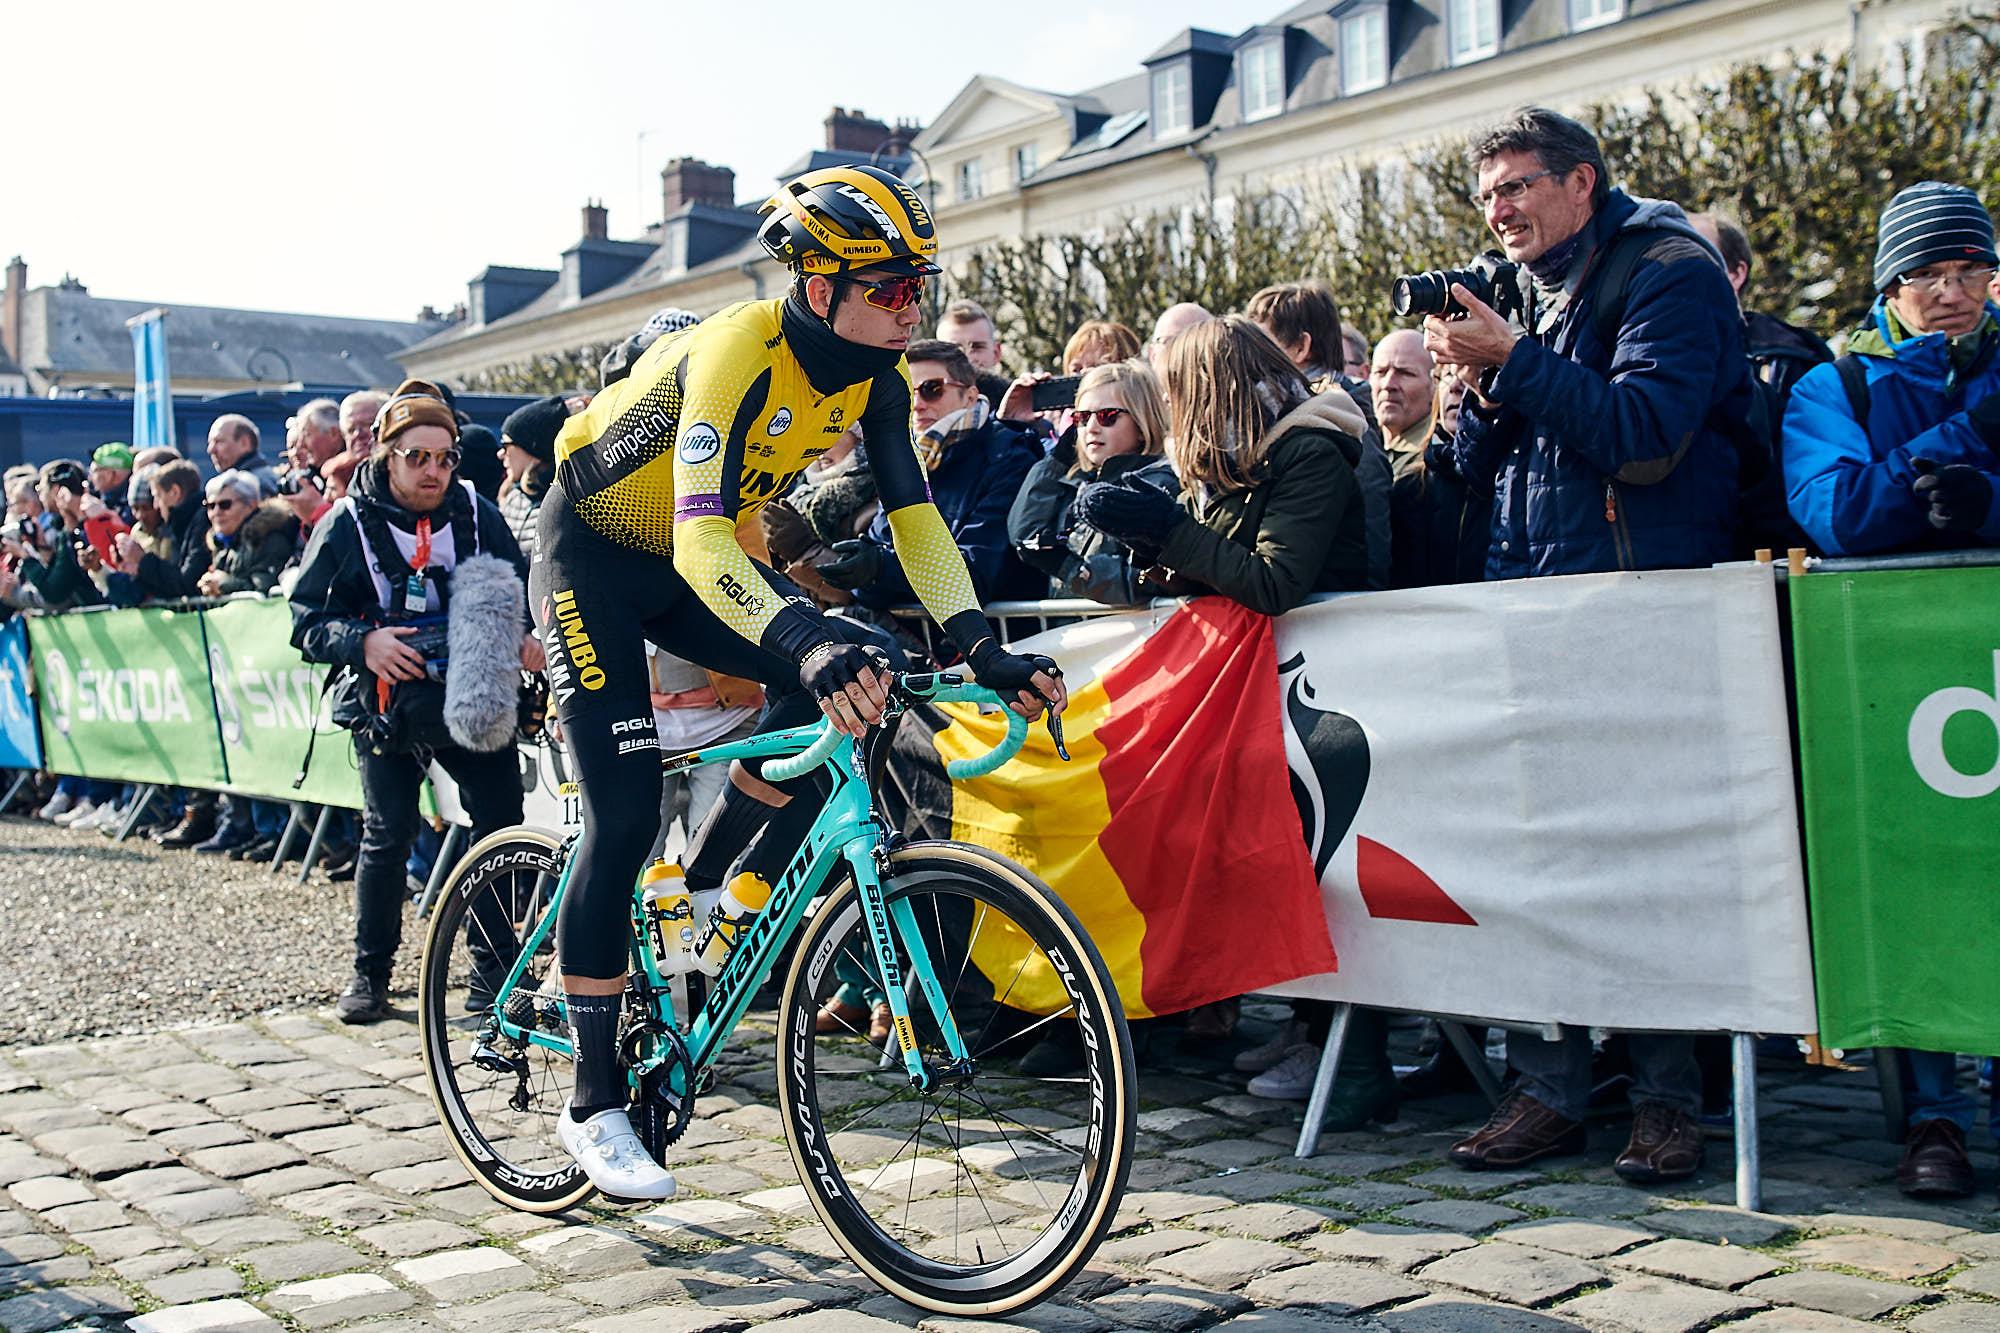 Wout van Aert just before the depart of Paris-Roubaix 2019